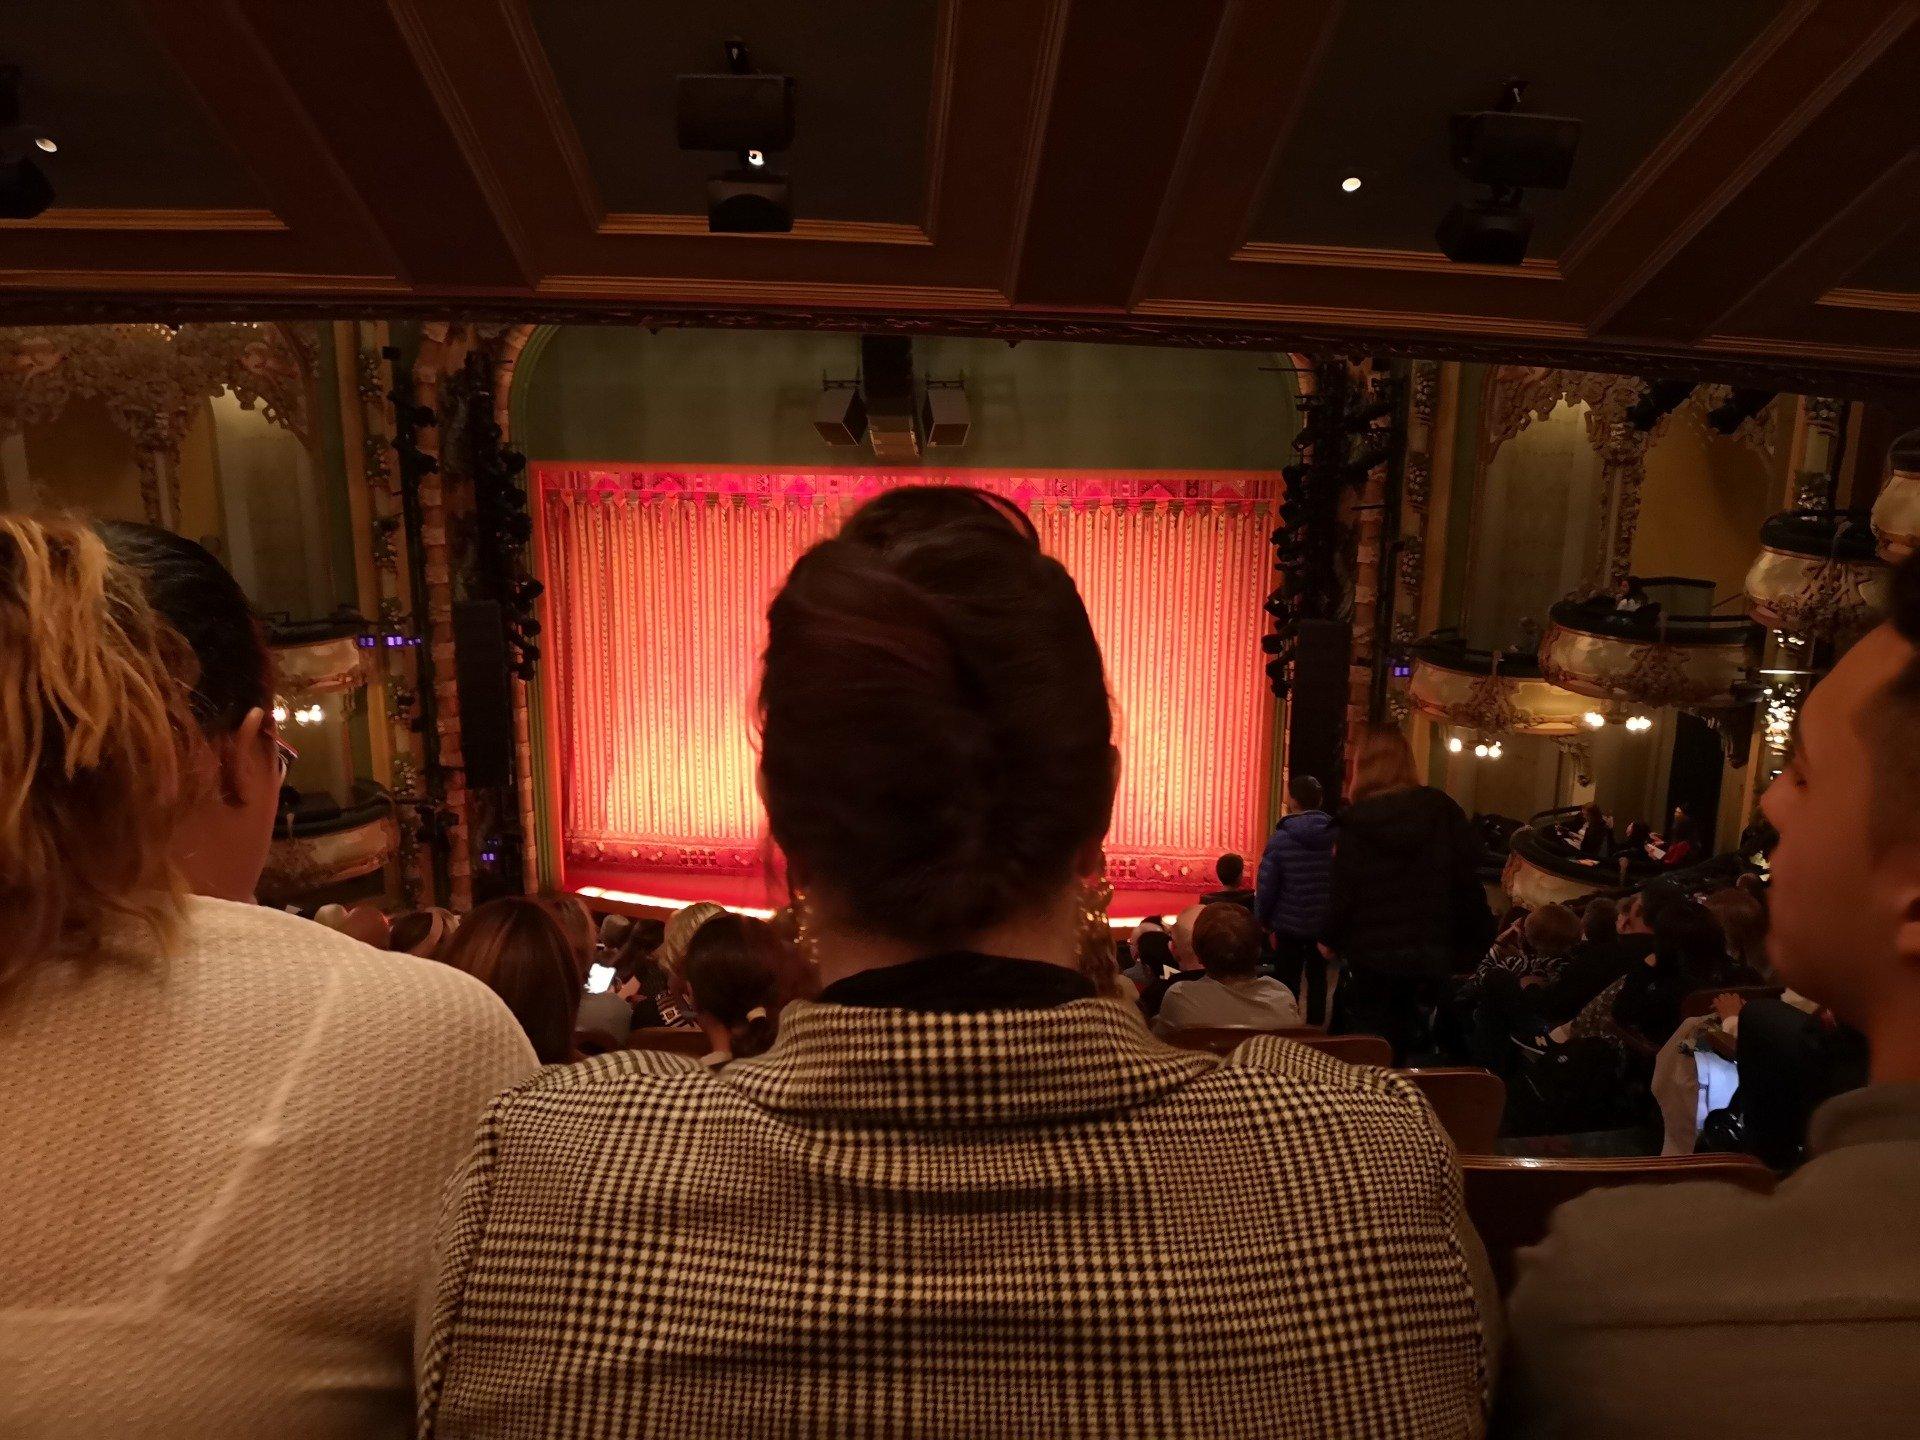 New Amsterdam Theatre Section Mezzanine C Row NN Seat 102